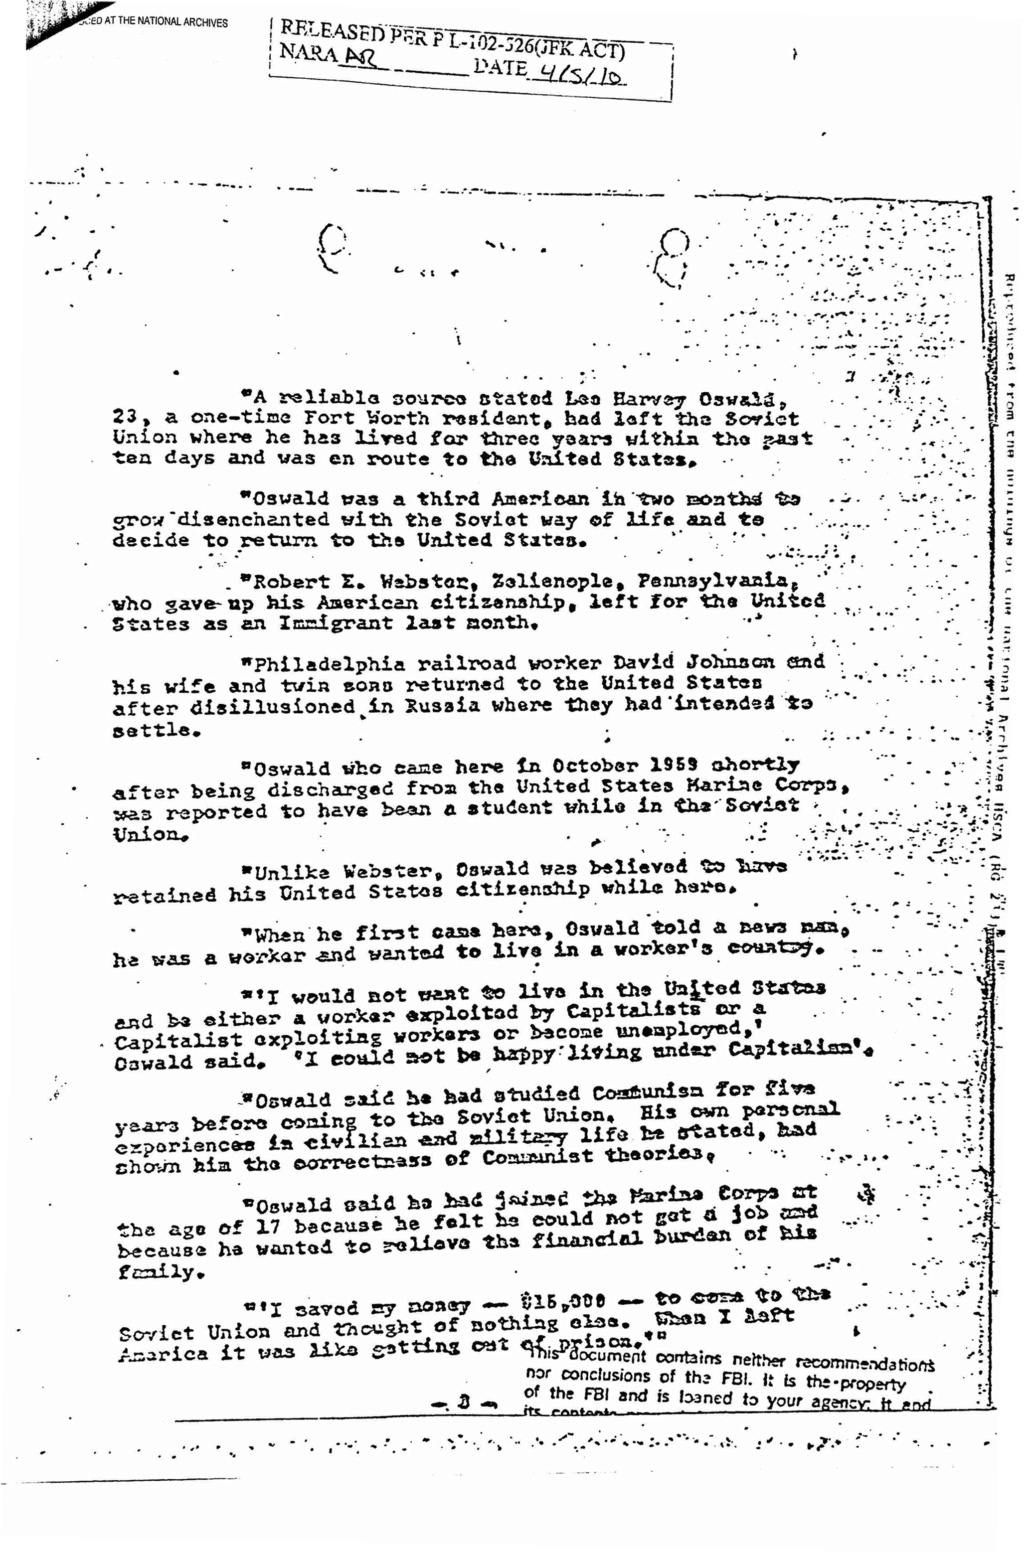 Texas Police Had Oswald Dossier Robert12